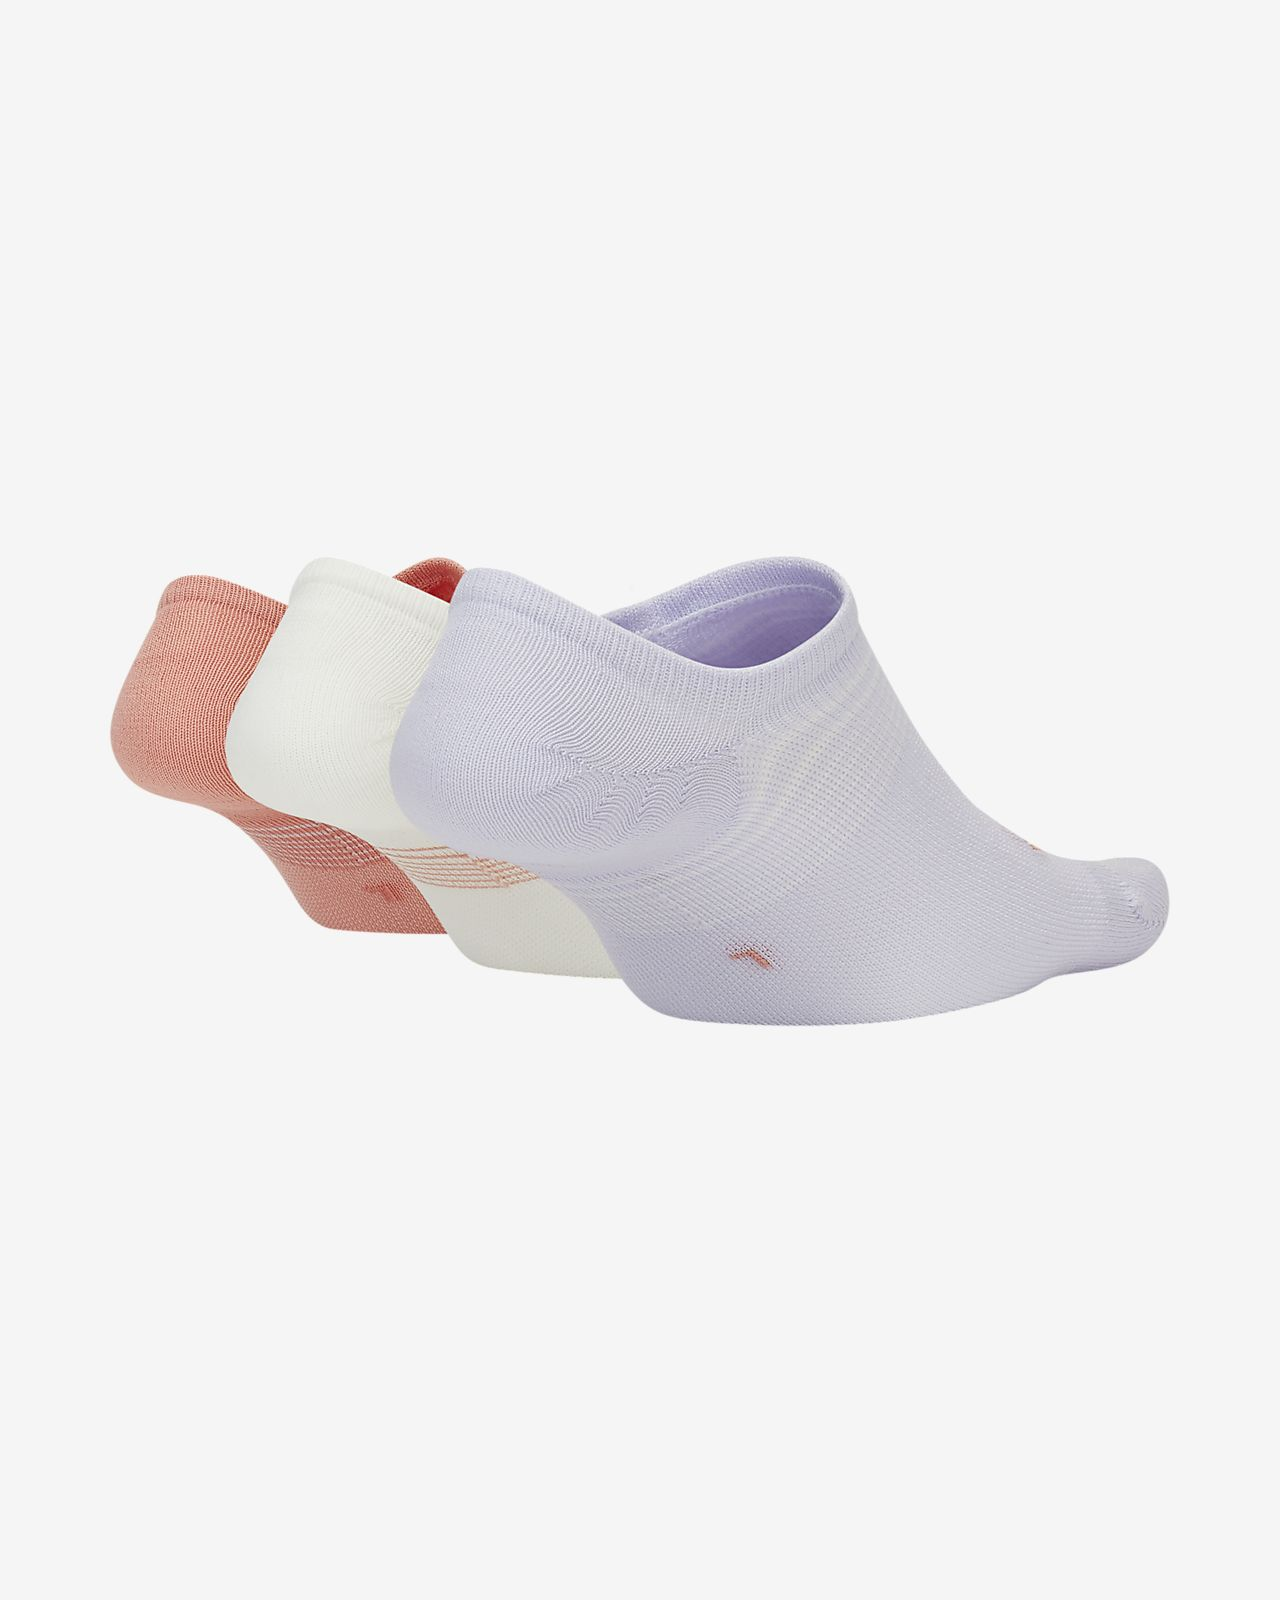 98a5137835c2e Nike Lightweight Training Socks (3 Pair). Nike.com